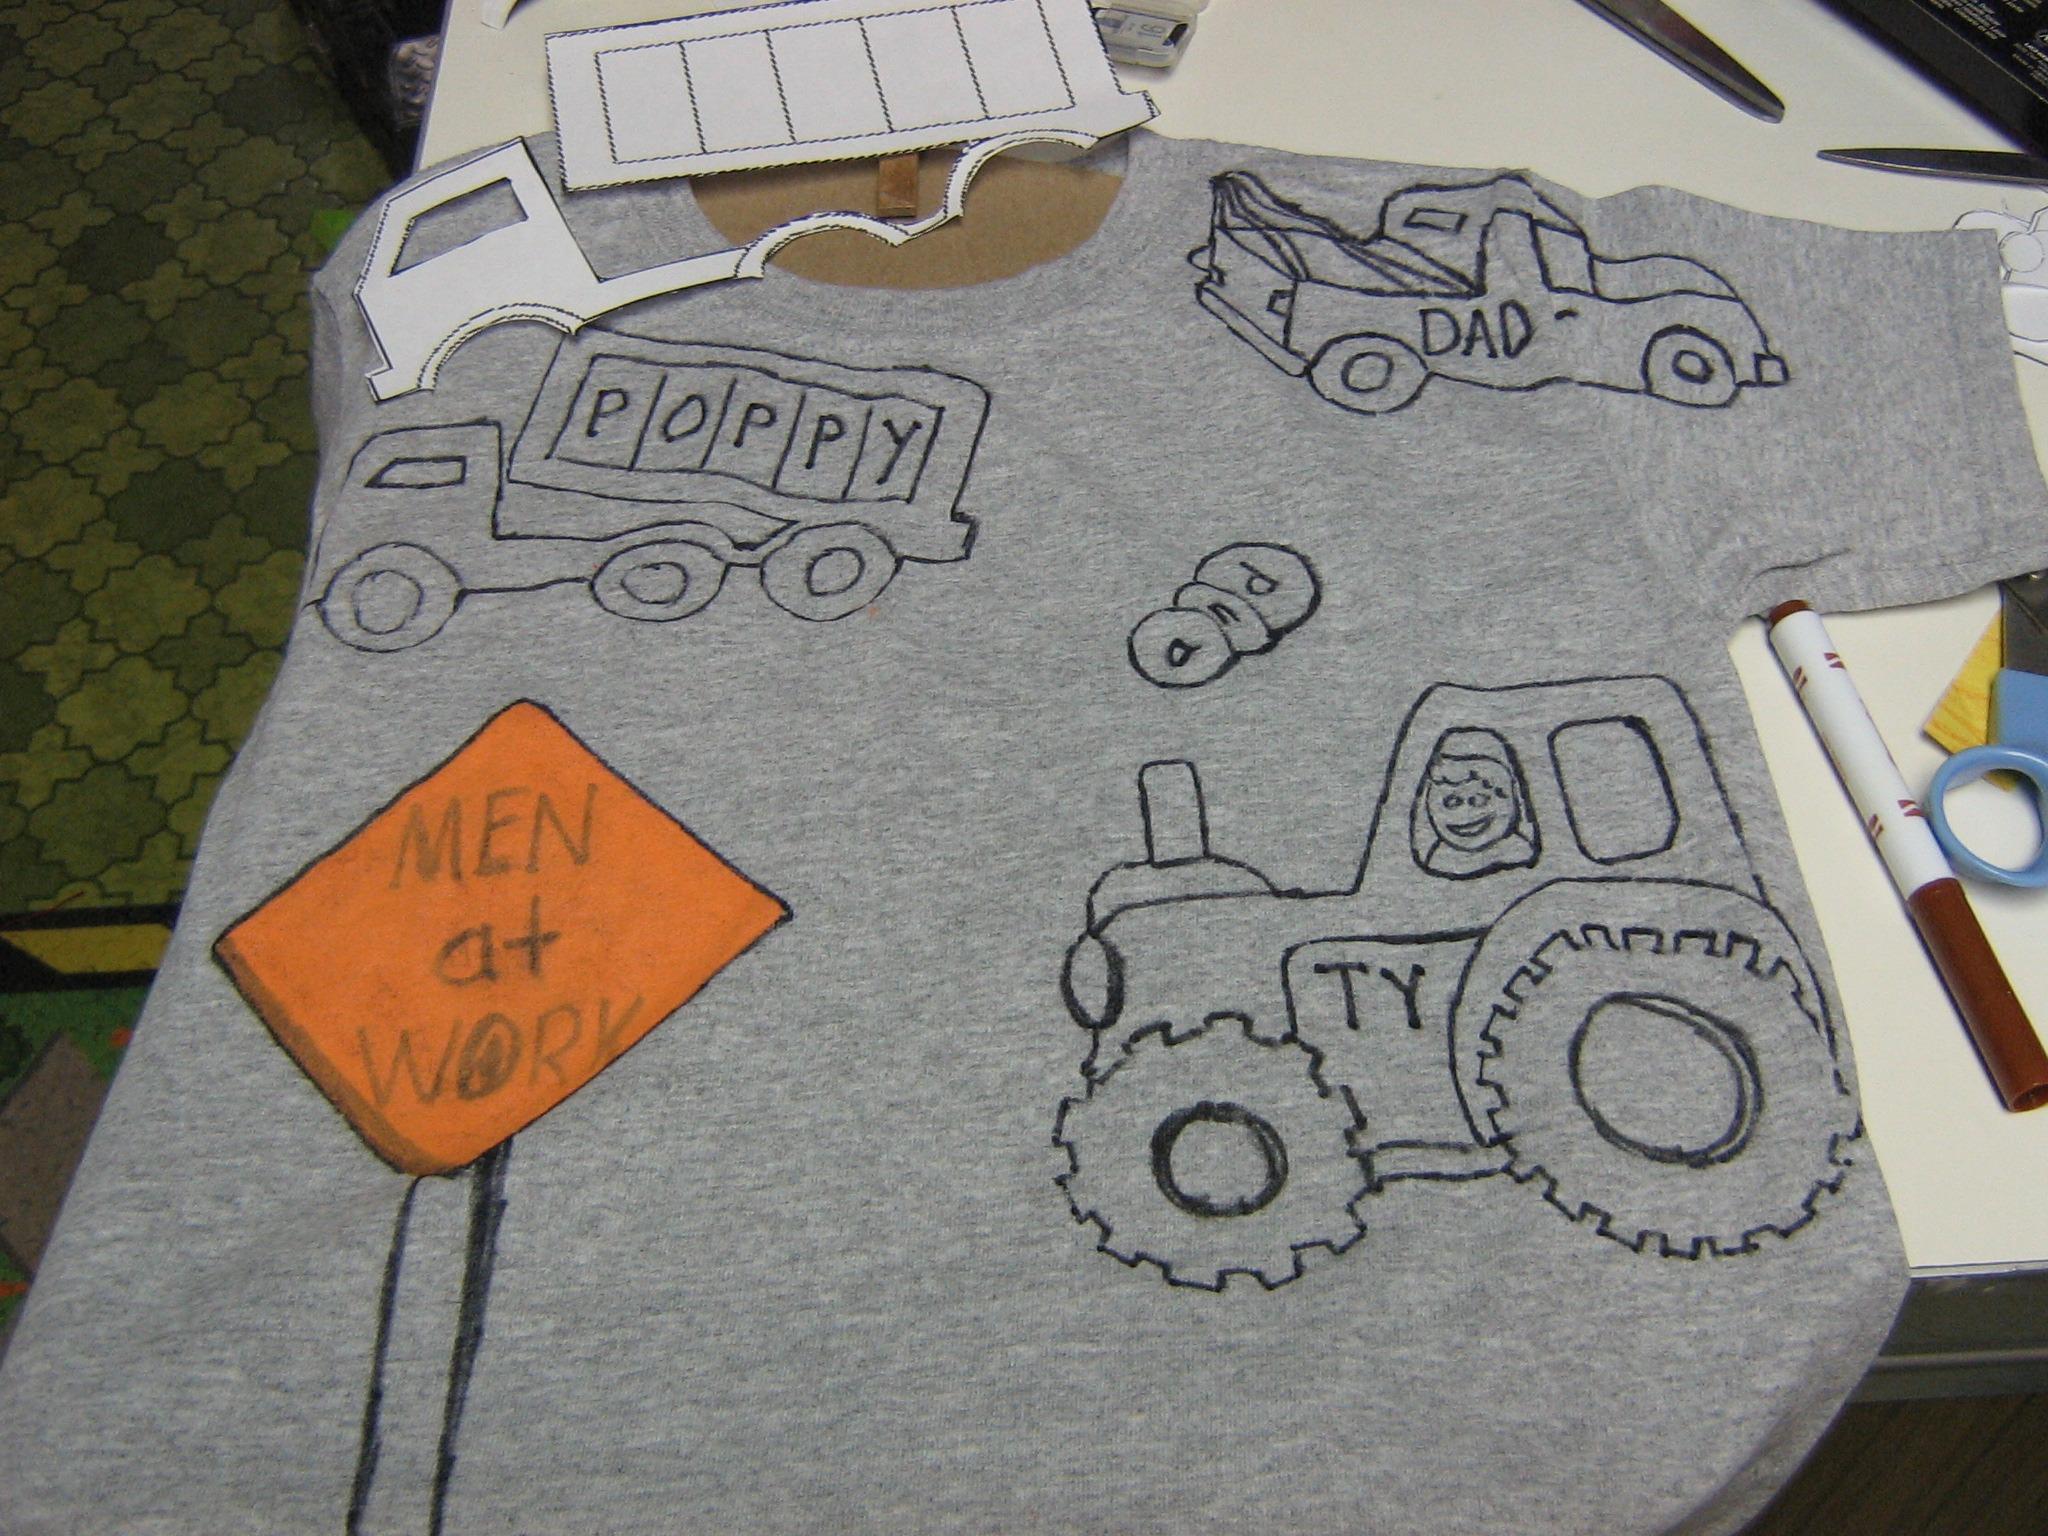 Fotos gratis : pintar, arte, camiseta, camisa, art, niños, dibujo ...